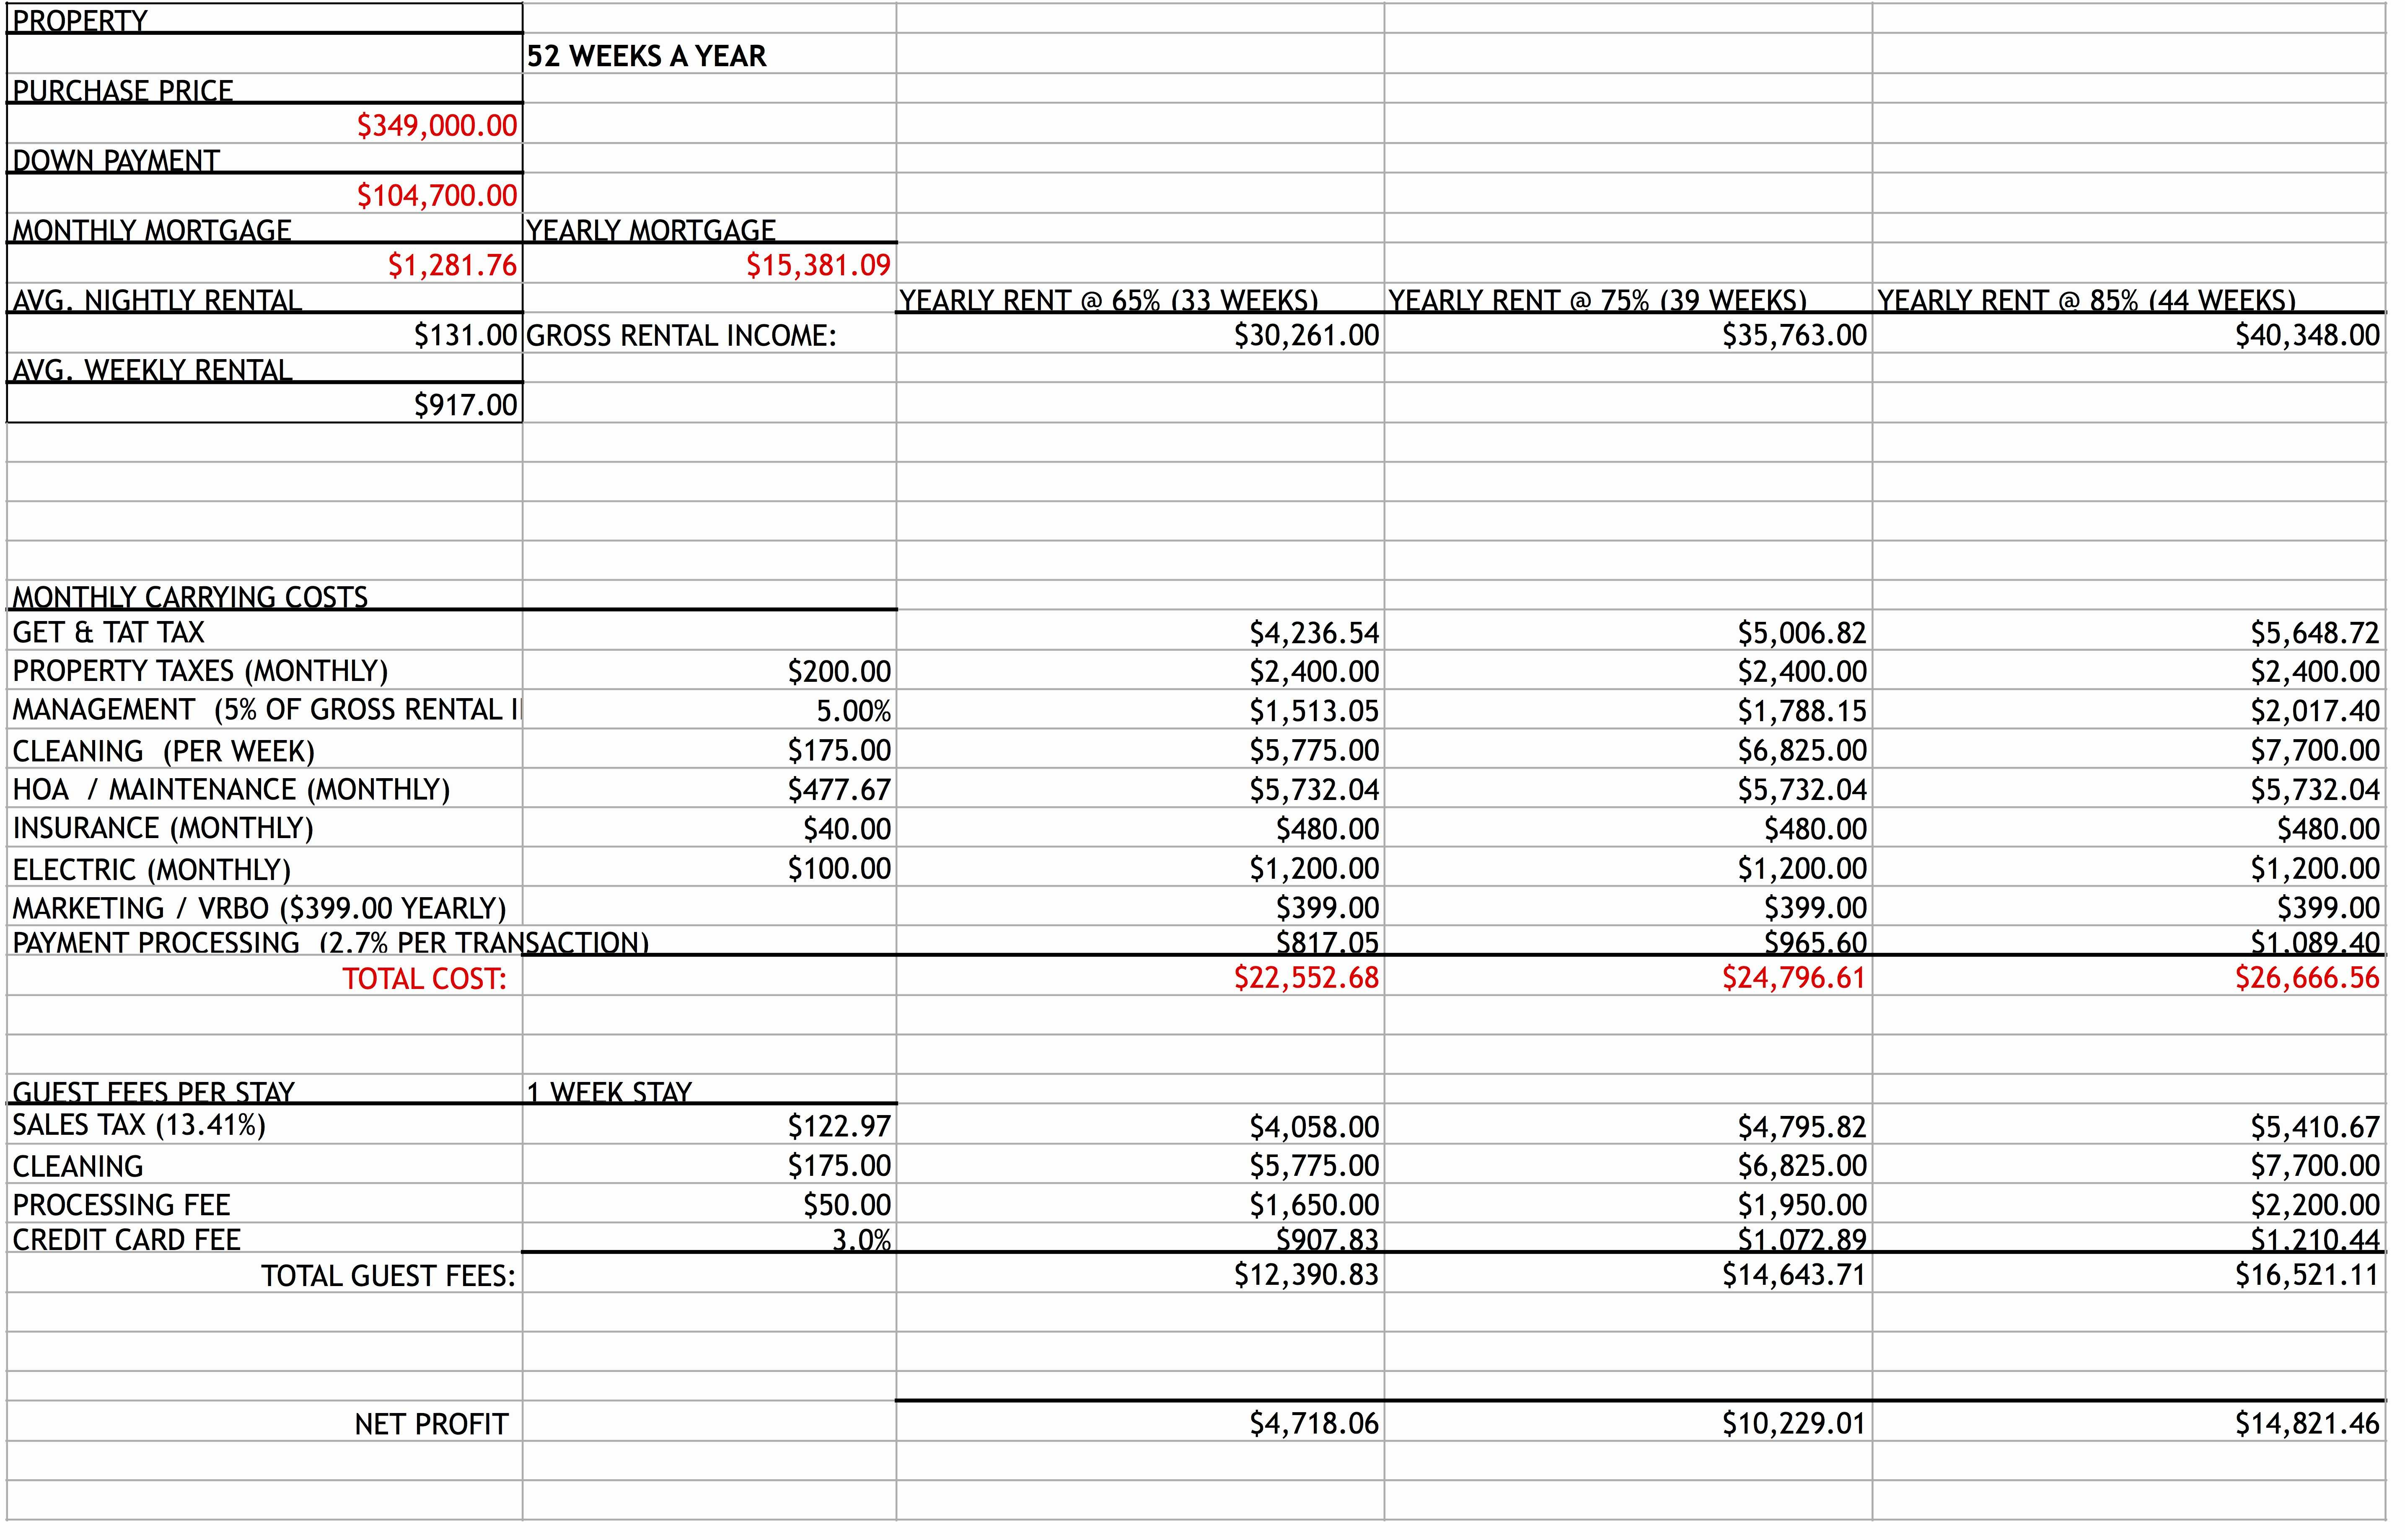 Rent Tracking Spreadsheet Inside Lease Tracking Spreadsheet As Well As Wineathomeit Lease Calculator